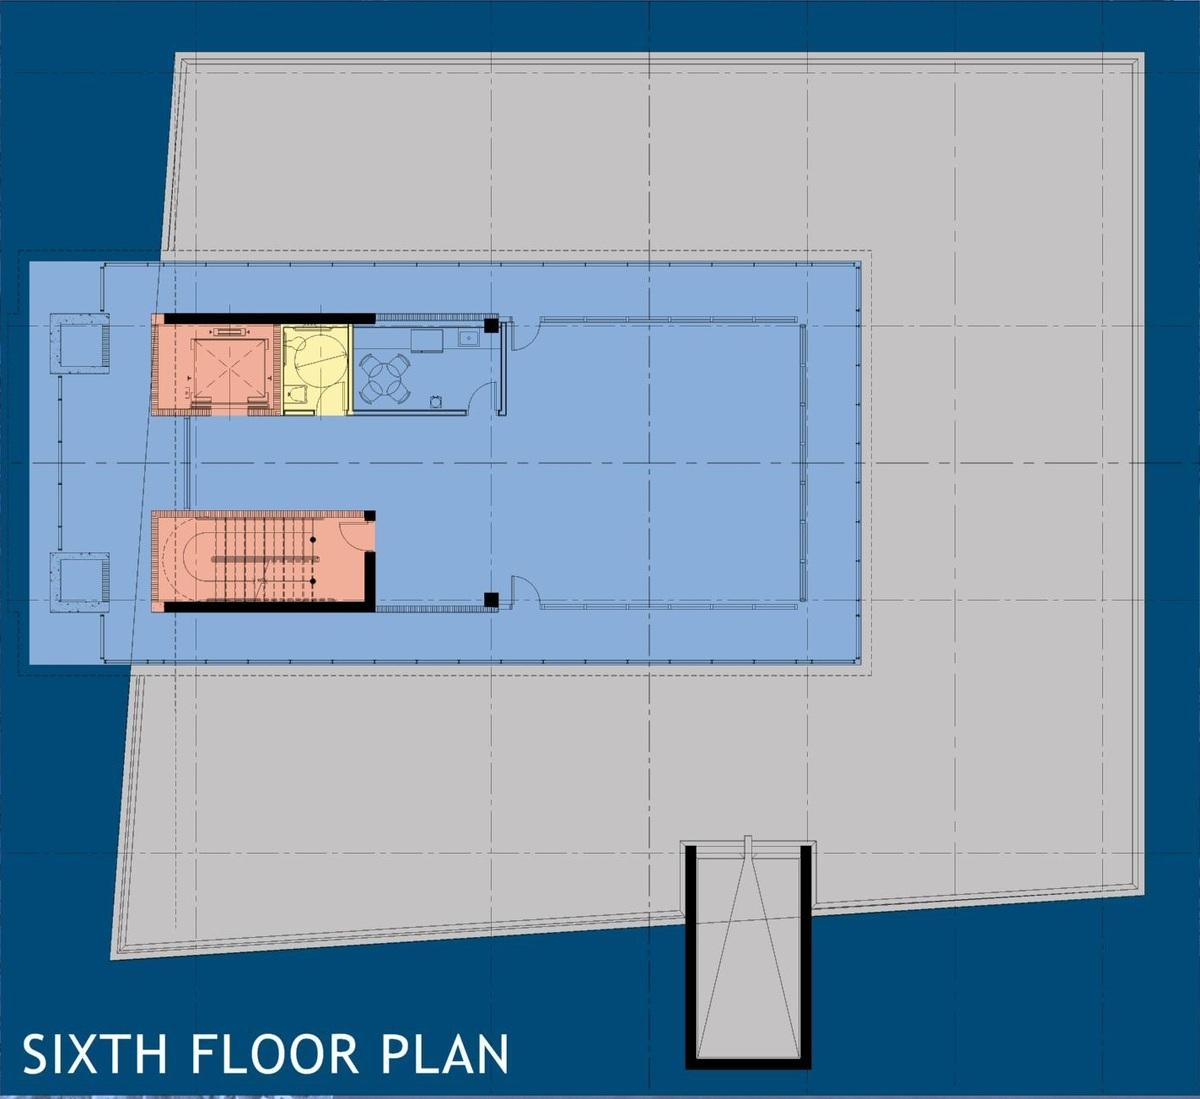 Sixth Floor Plan (Tower)